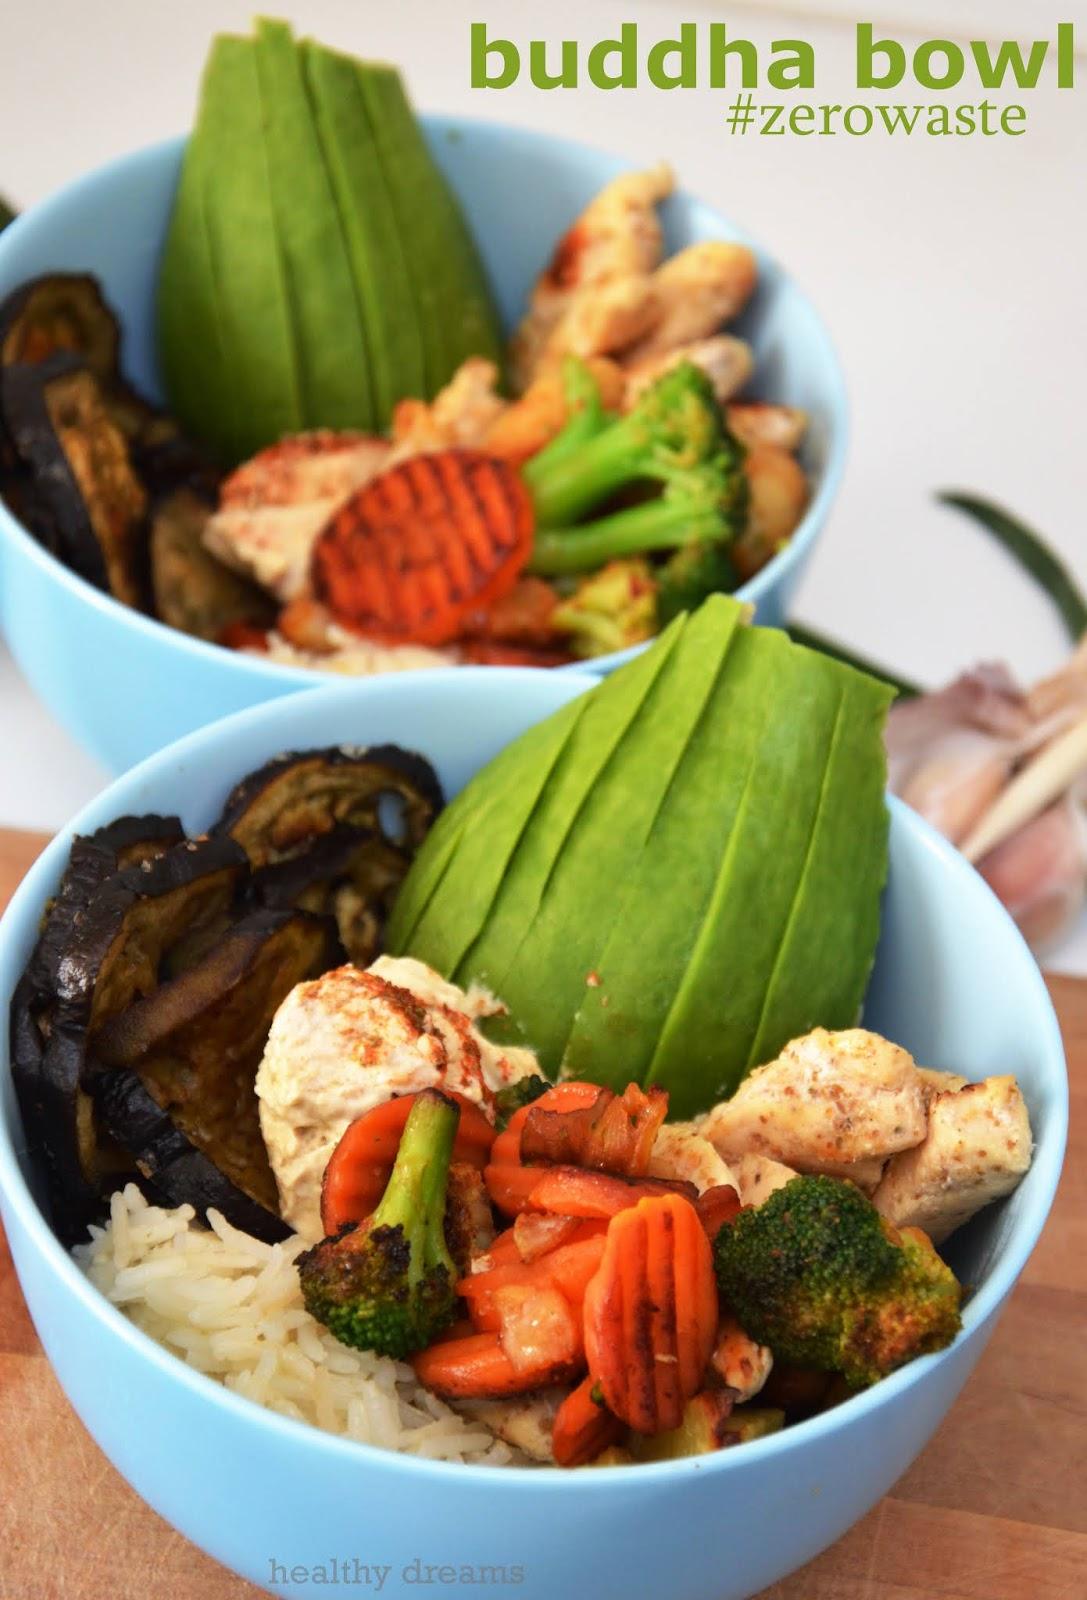 buddha bowl #zerowaste         |          Healthy Dreams